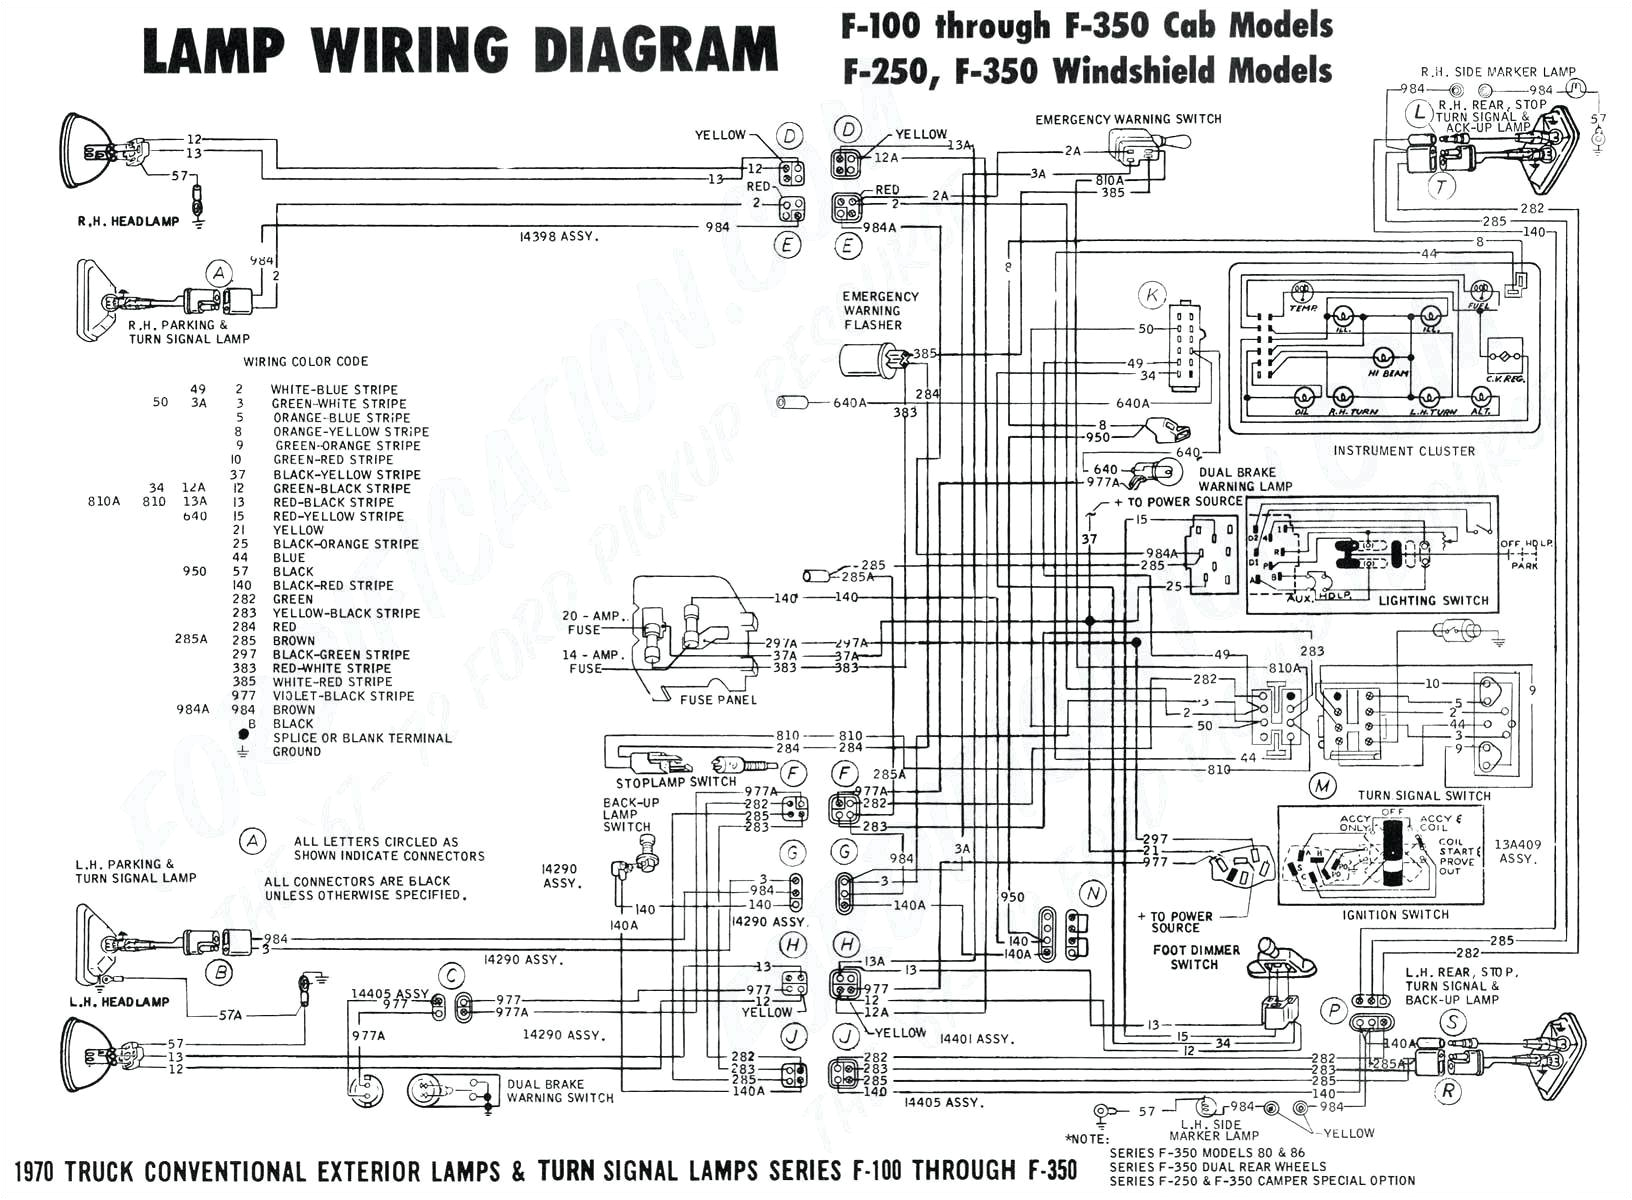 electric space heater wiring diagram wiring diagram infolakewood heater wiring diagram wiring diagram insider2004 buick rainier